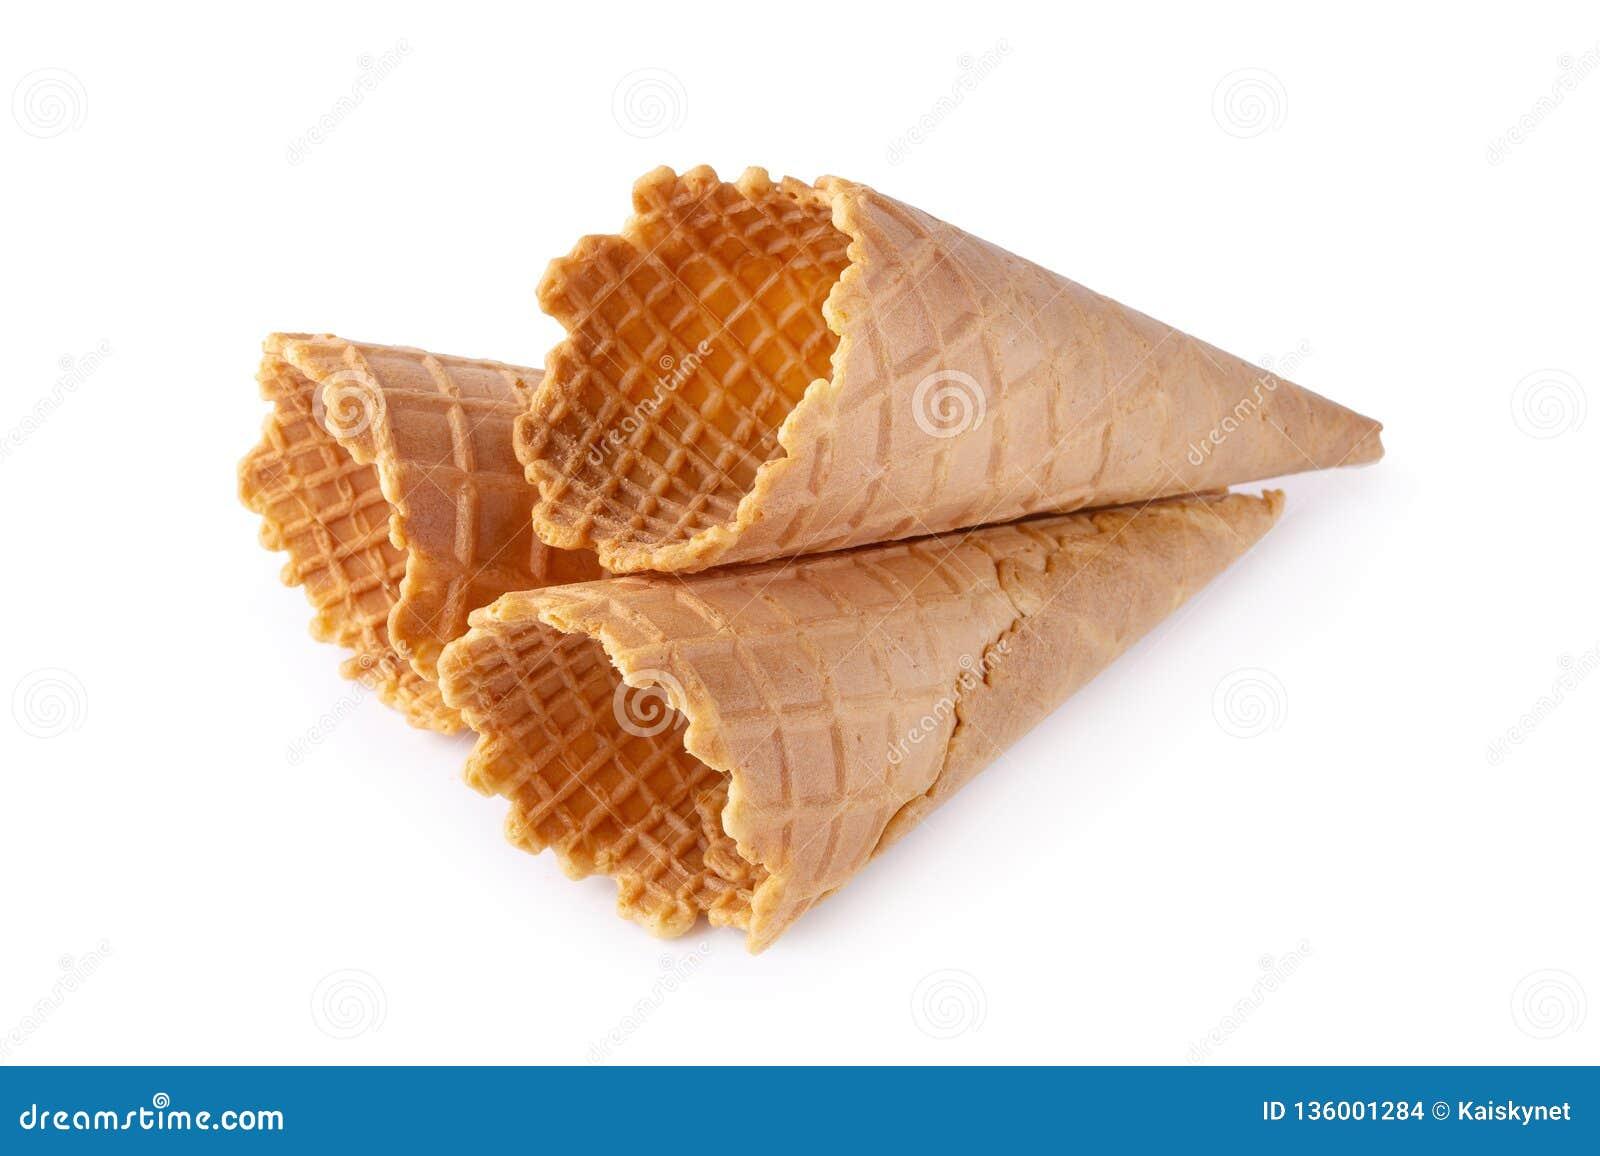 Waffle Ice Cream Cone Isolated Over White Background Stock